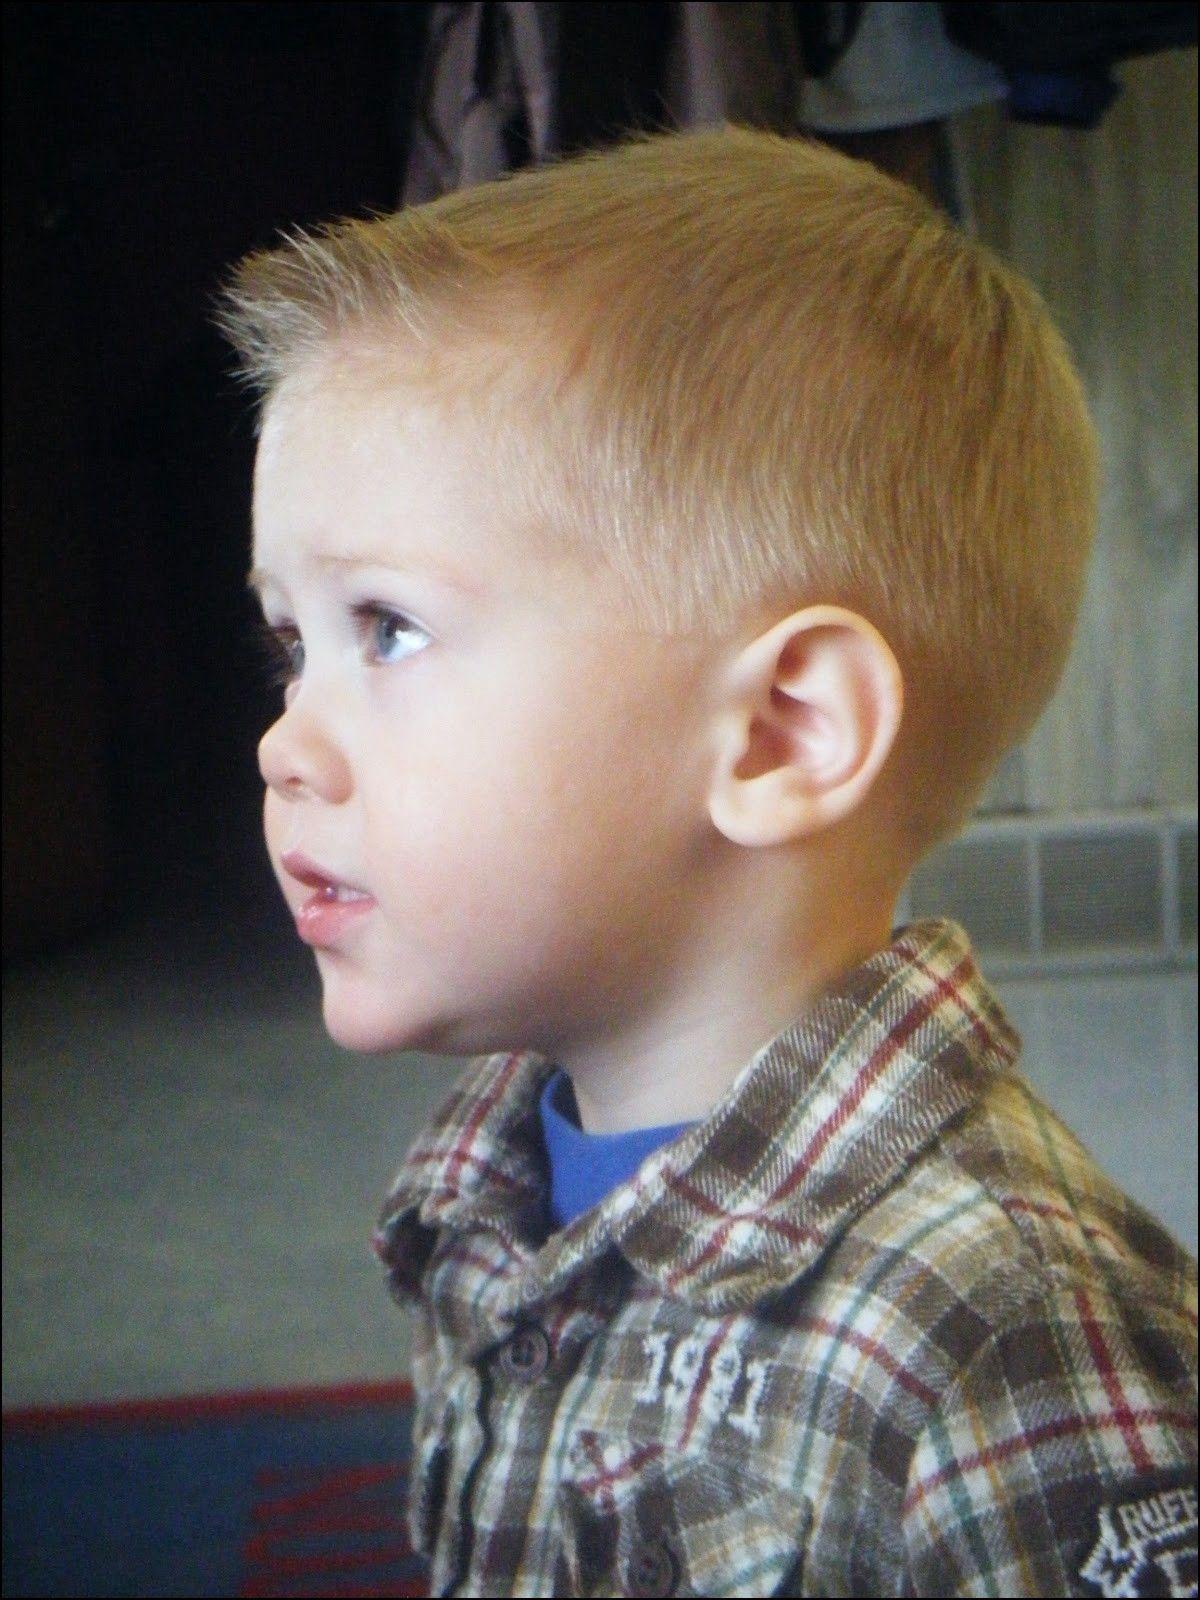 Year Old Haircut  Jace  Pinterest  Toddler boy haircuts Hair